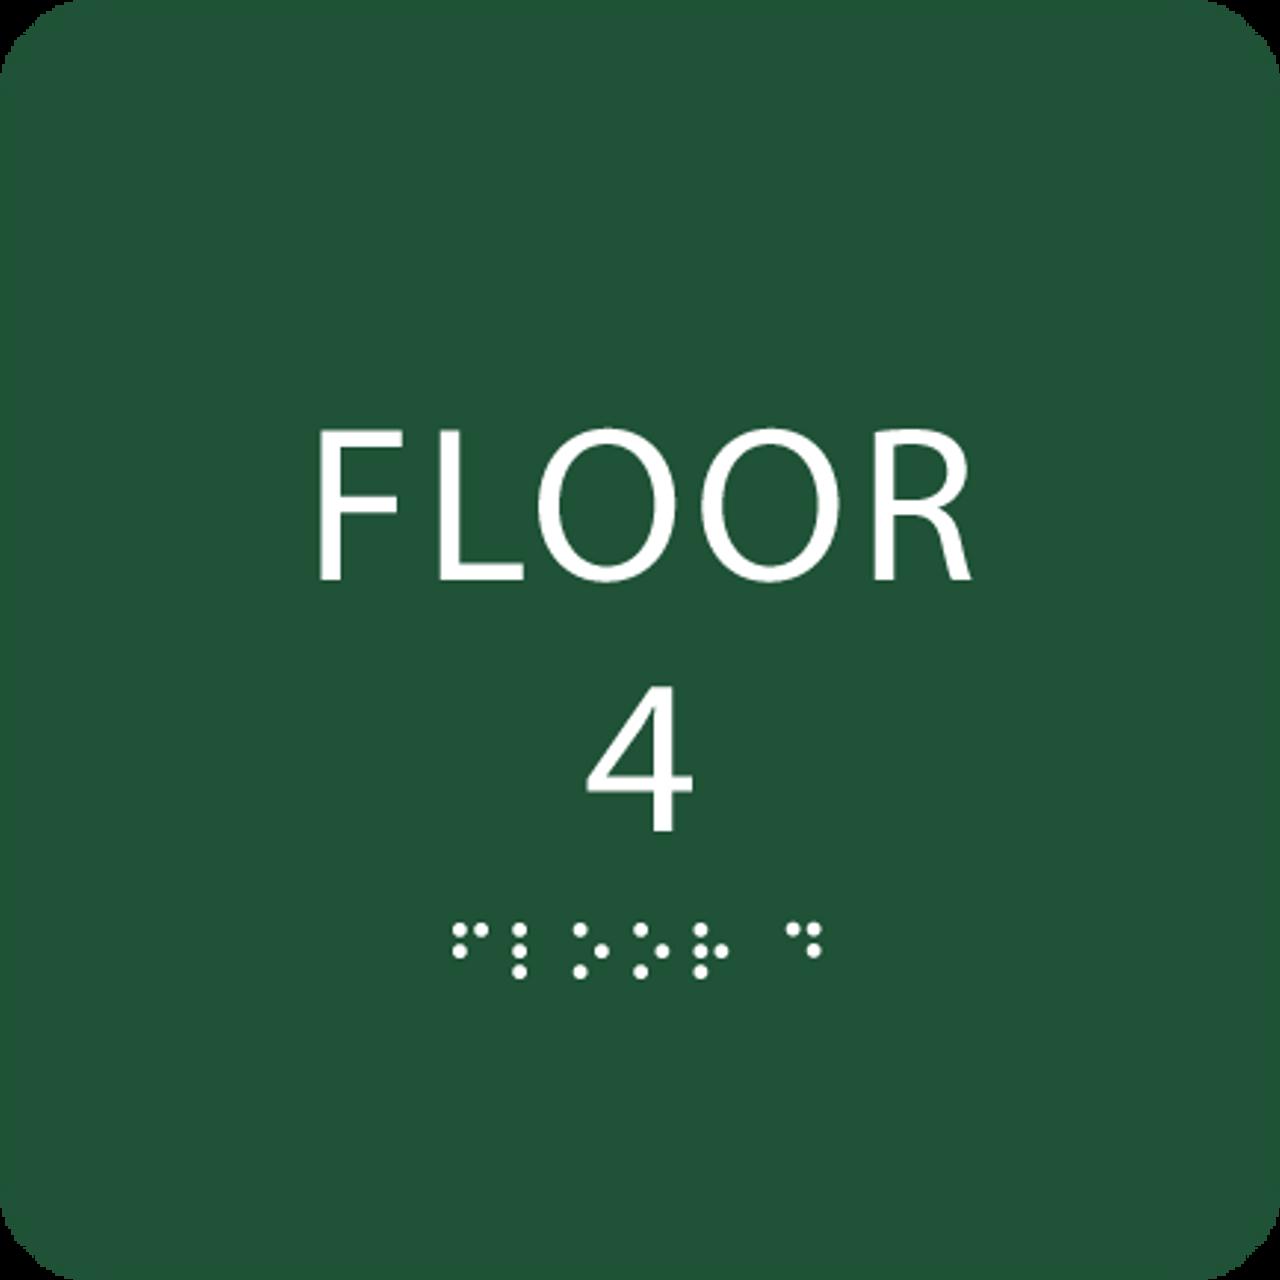 Green Floor 4 Identification Sign